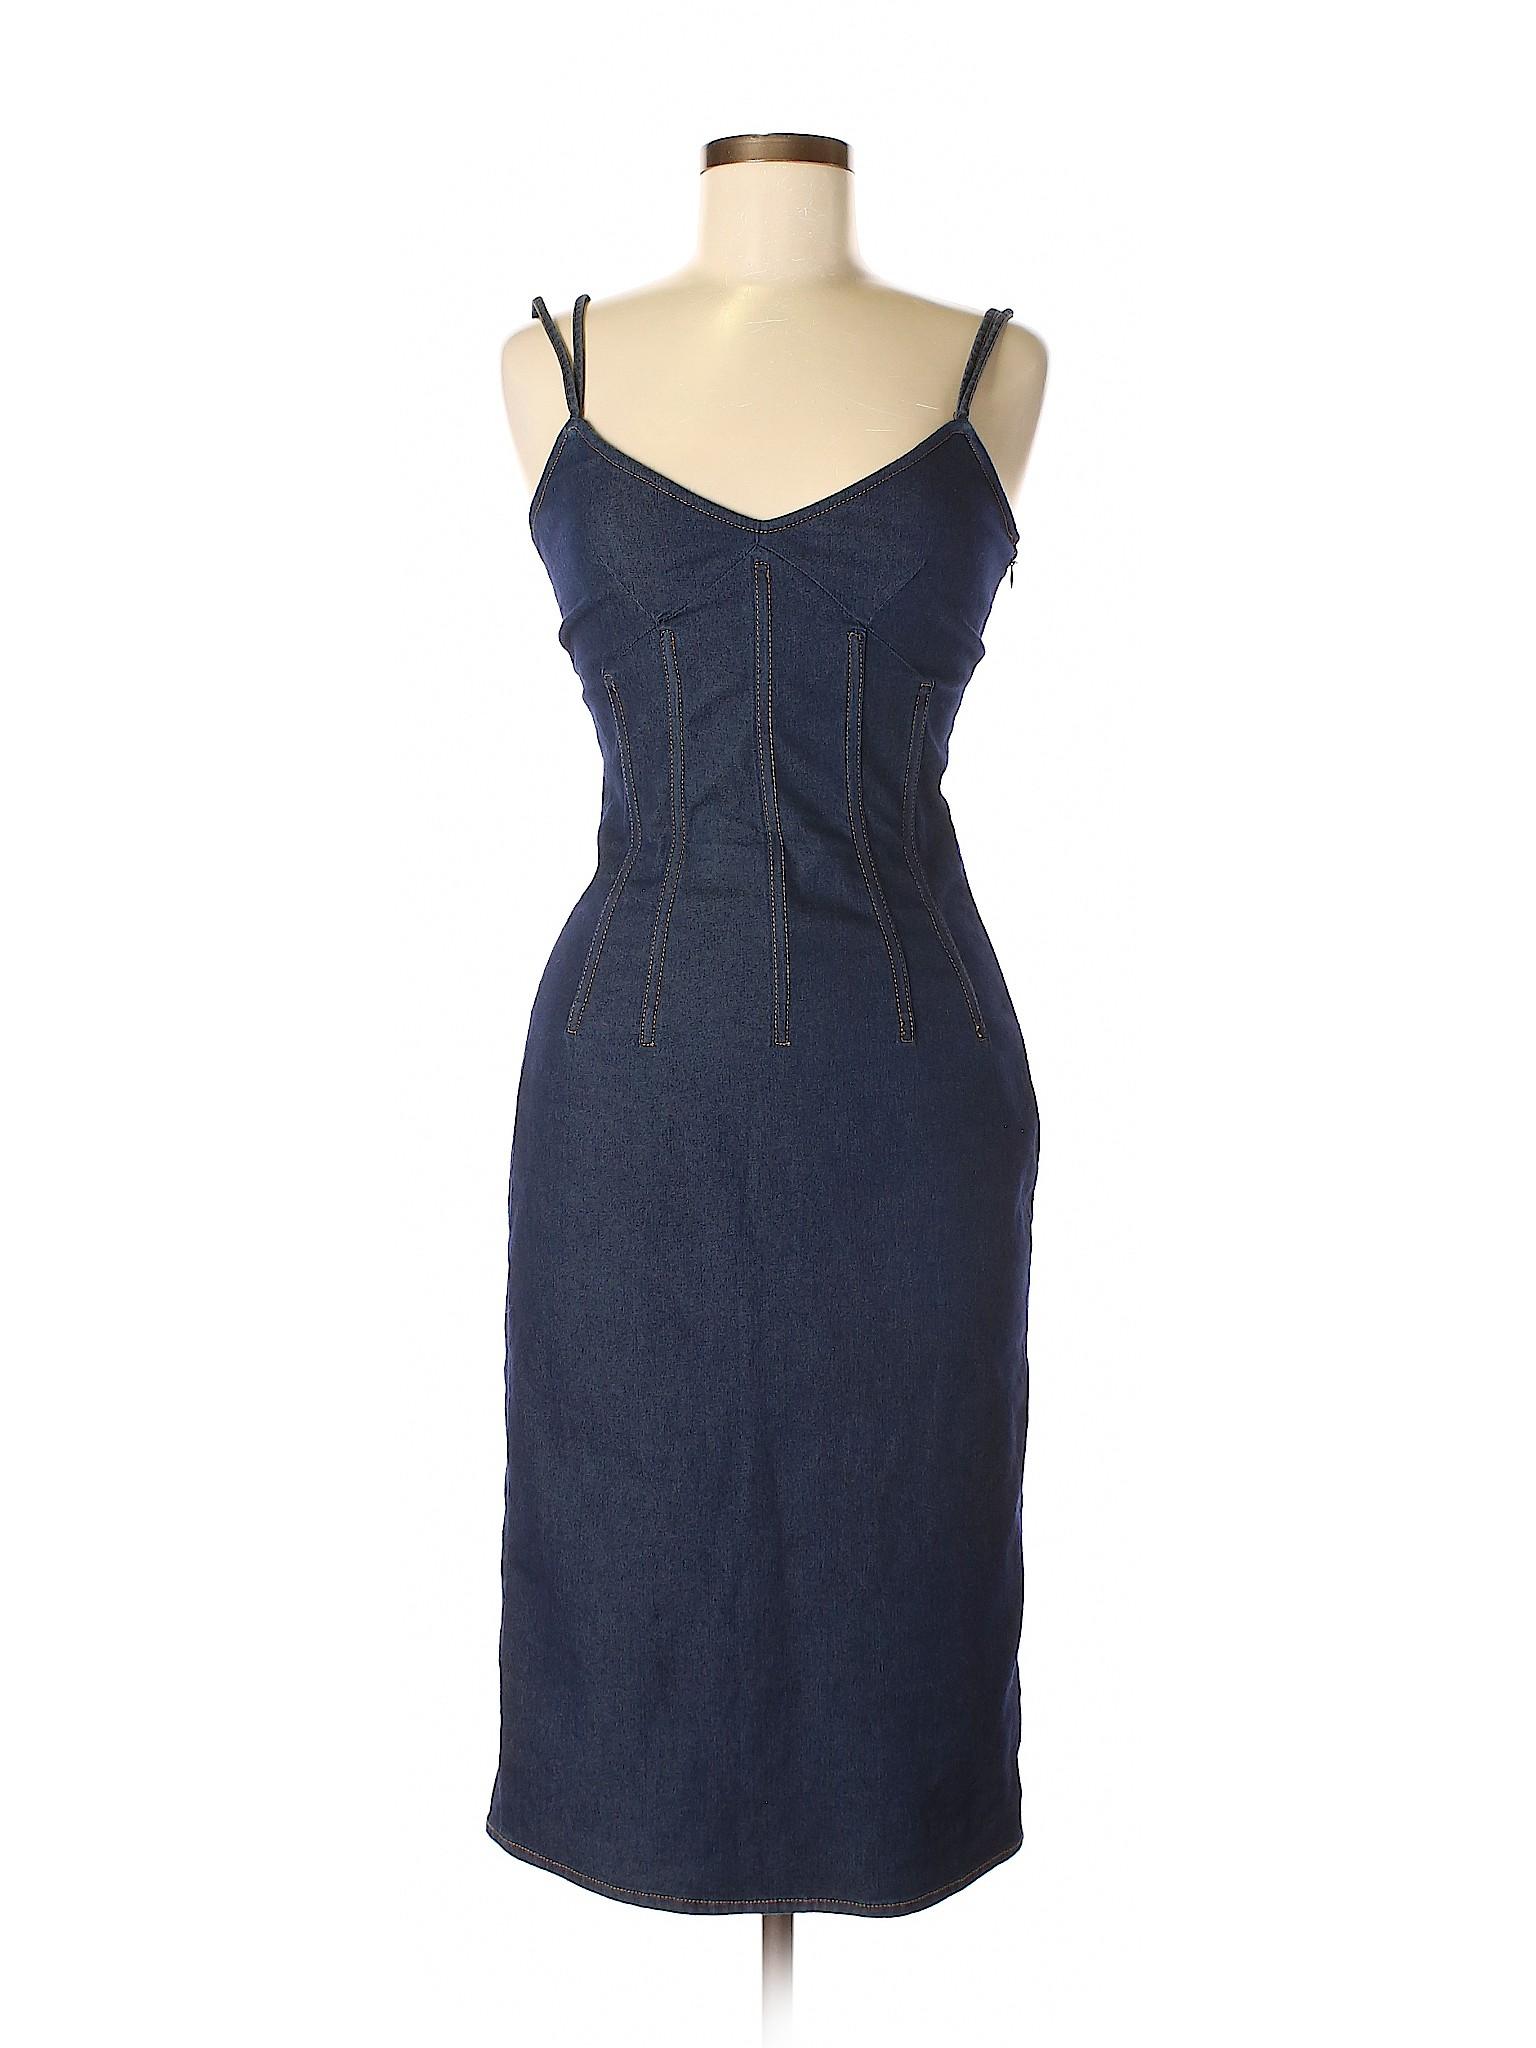 amp; Selling D Gabbana amp;G Dress Dolce Casual 7wBrwxPn